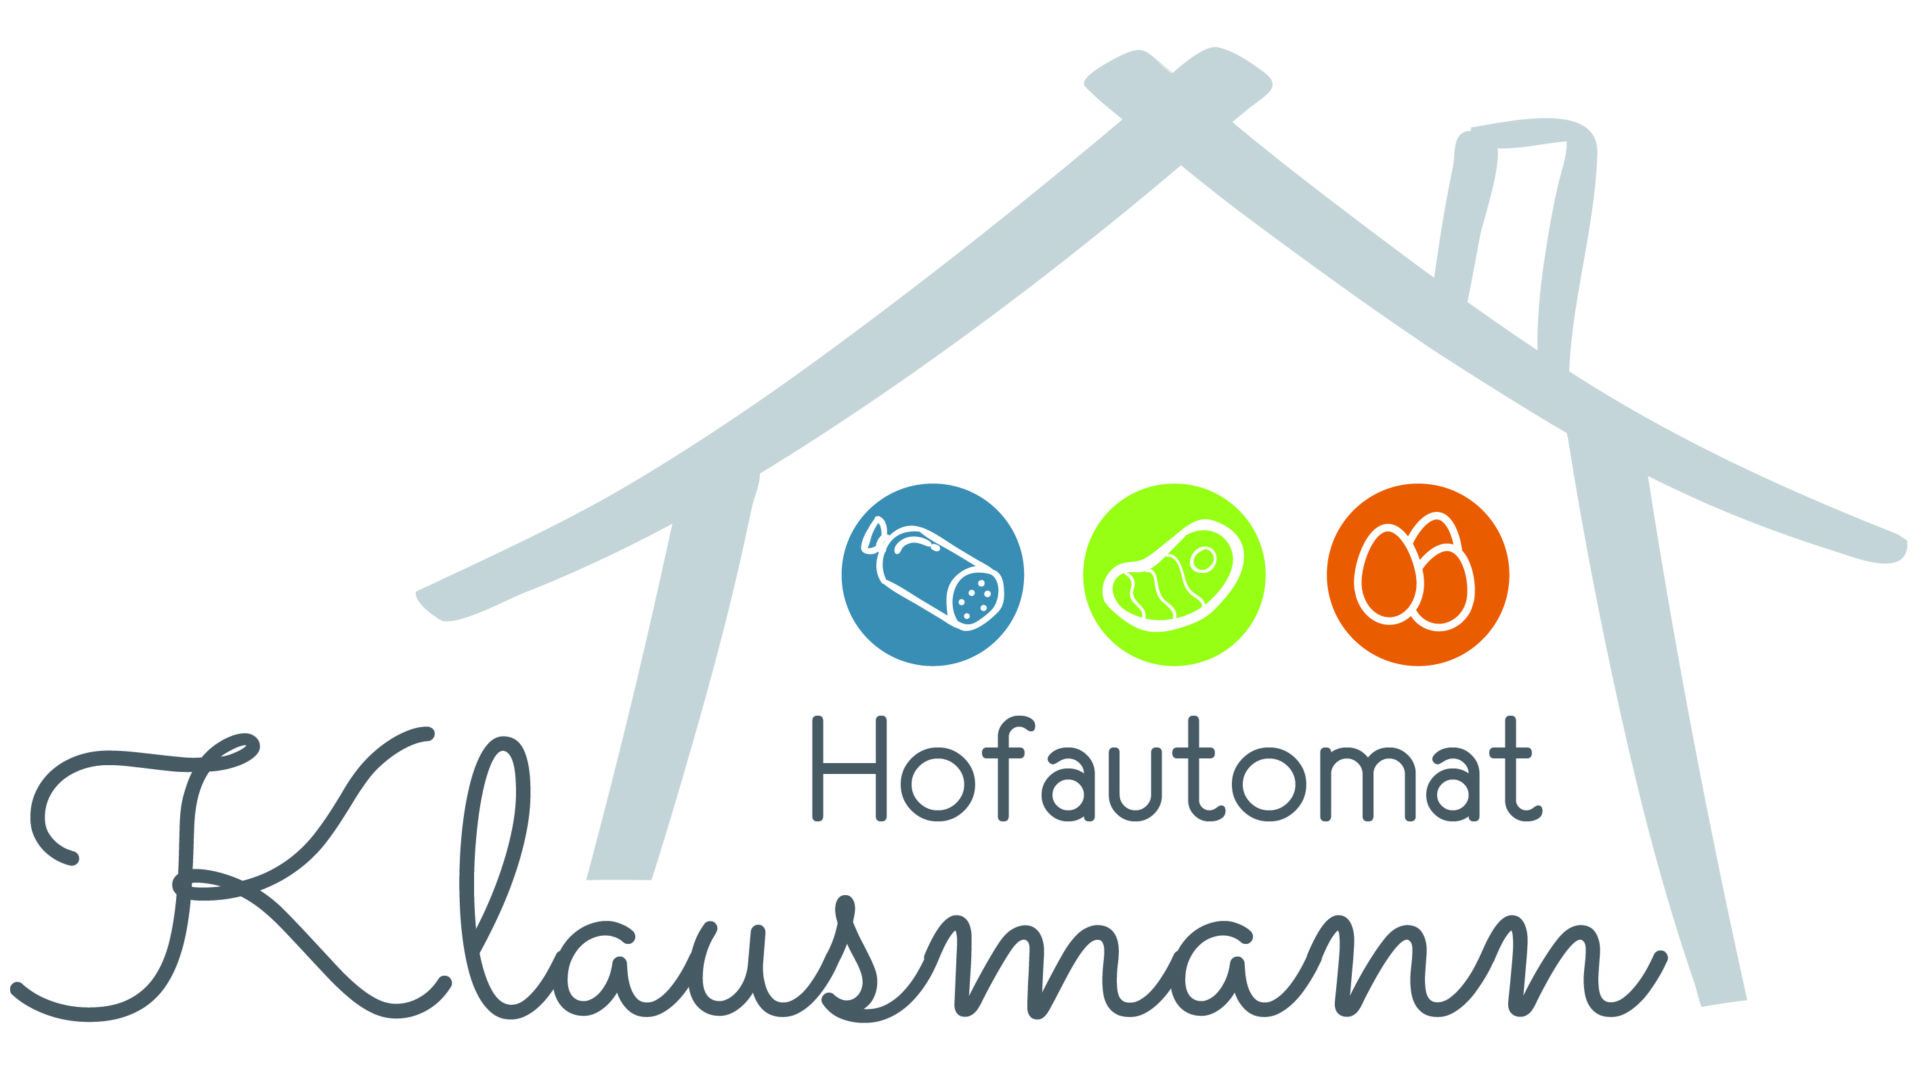 Hofautomat Klausmann Logo